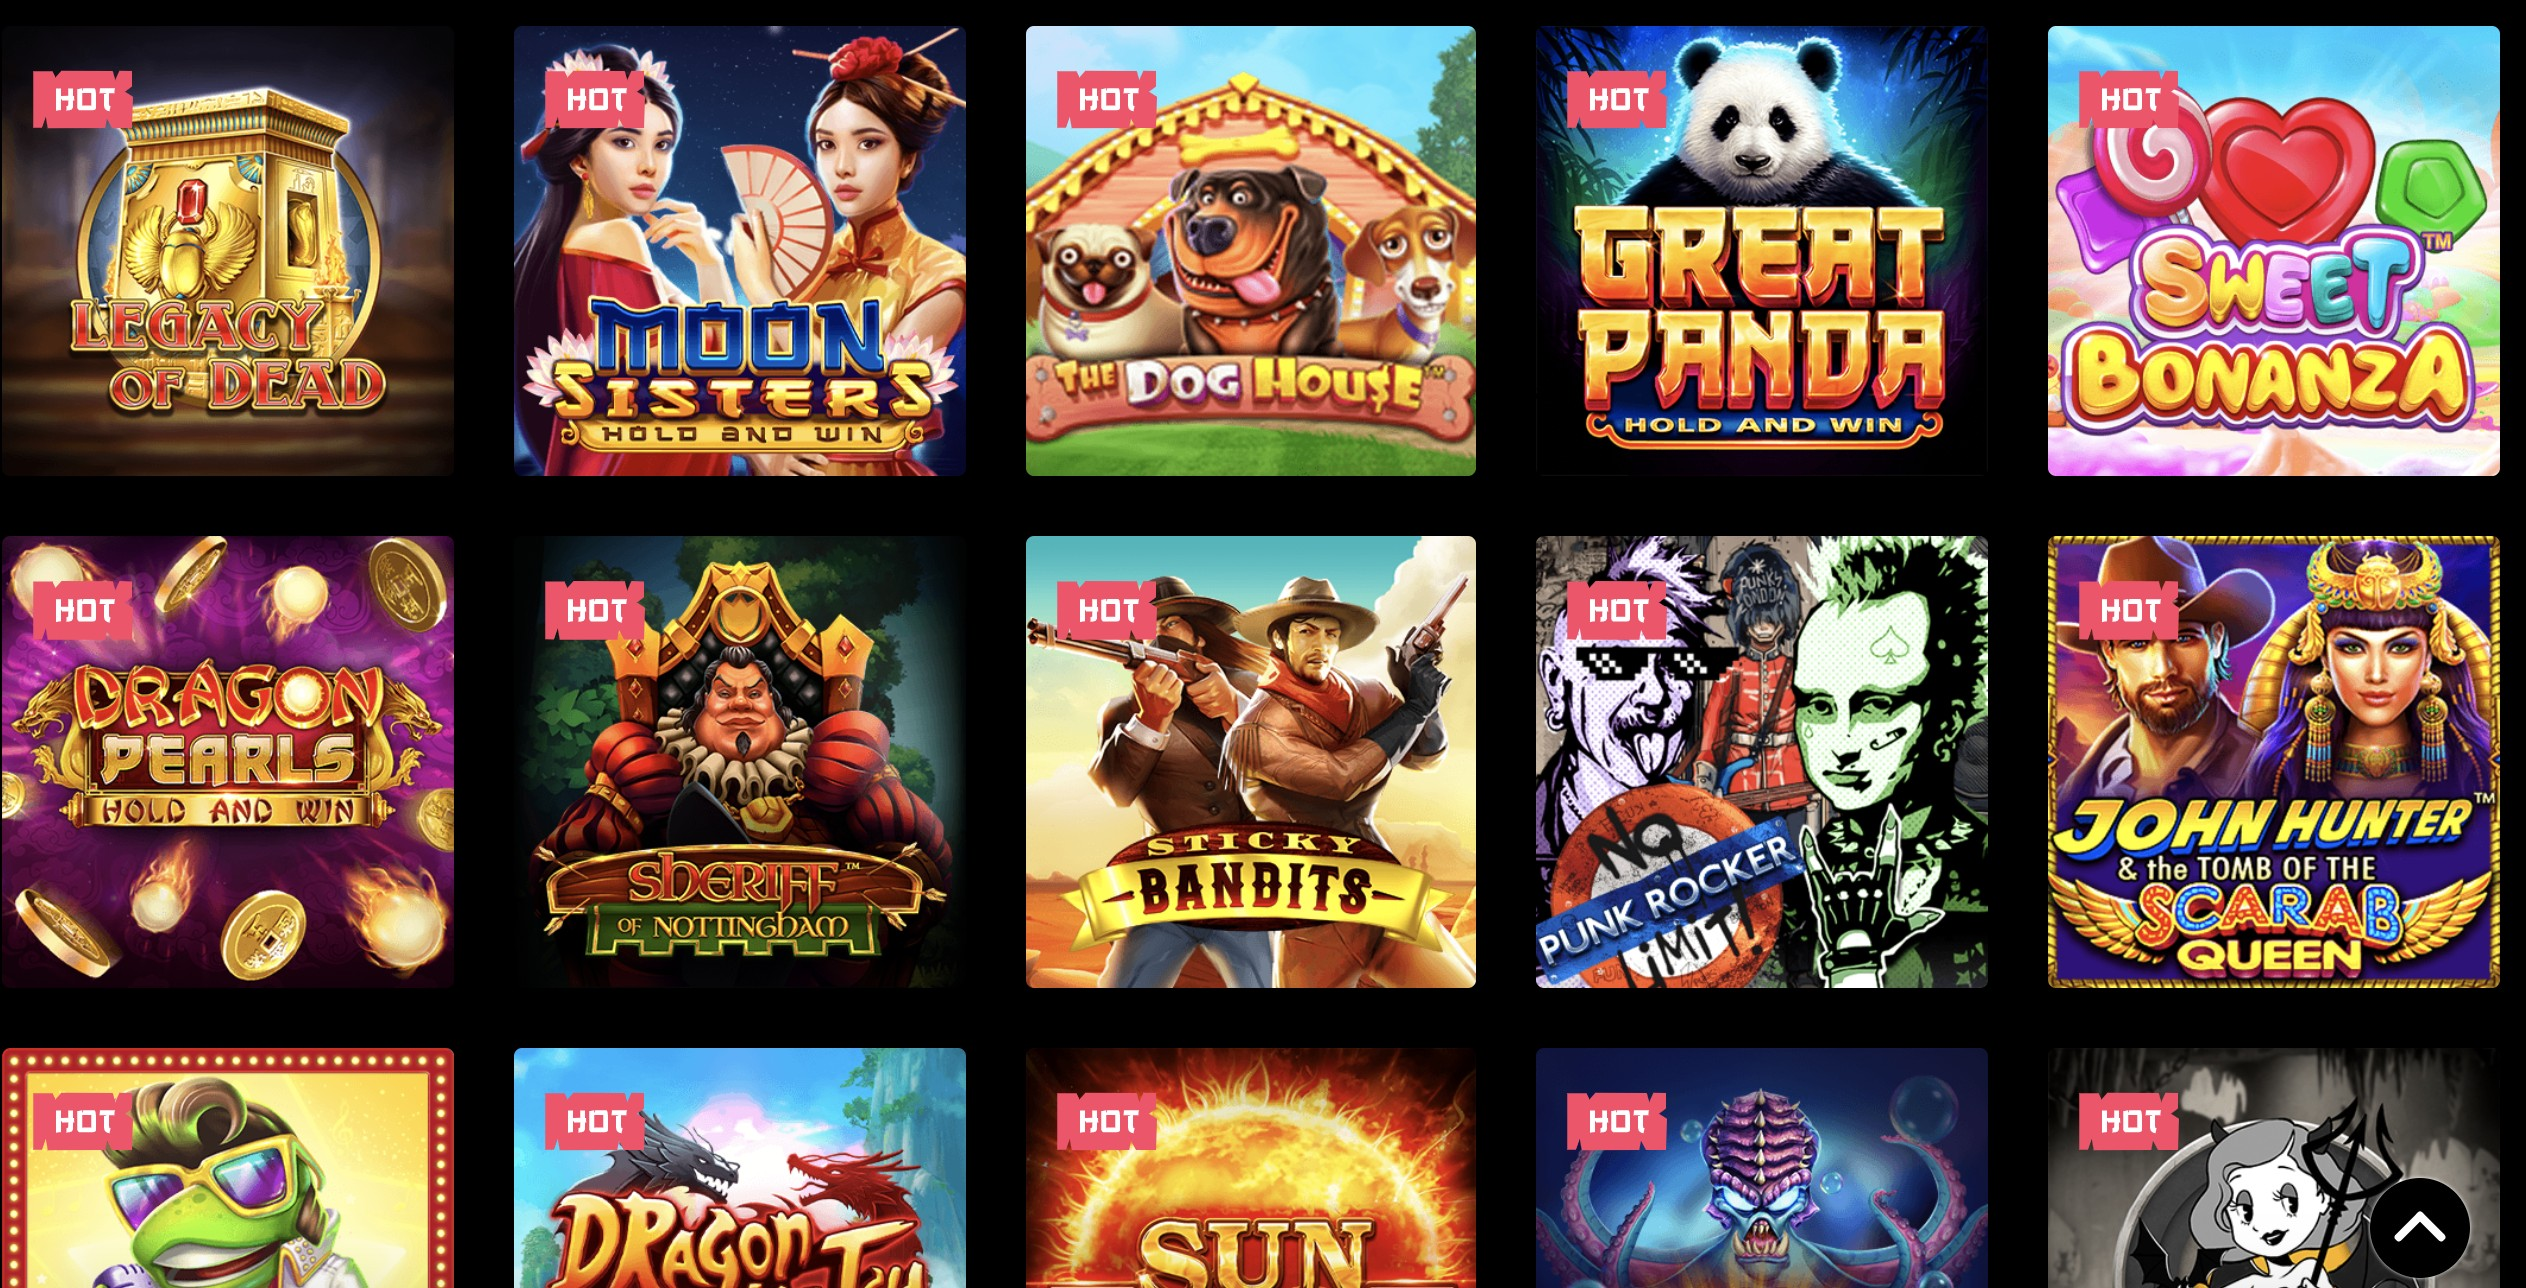 Casino Games at Spin Samurai